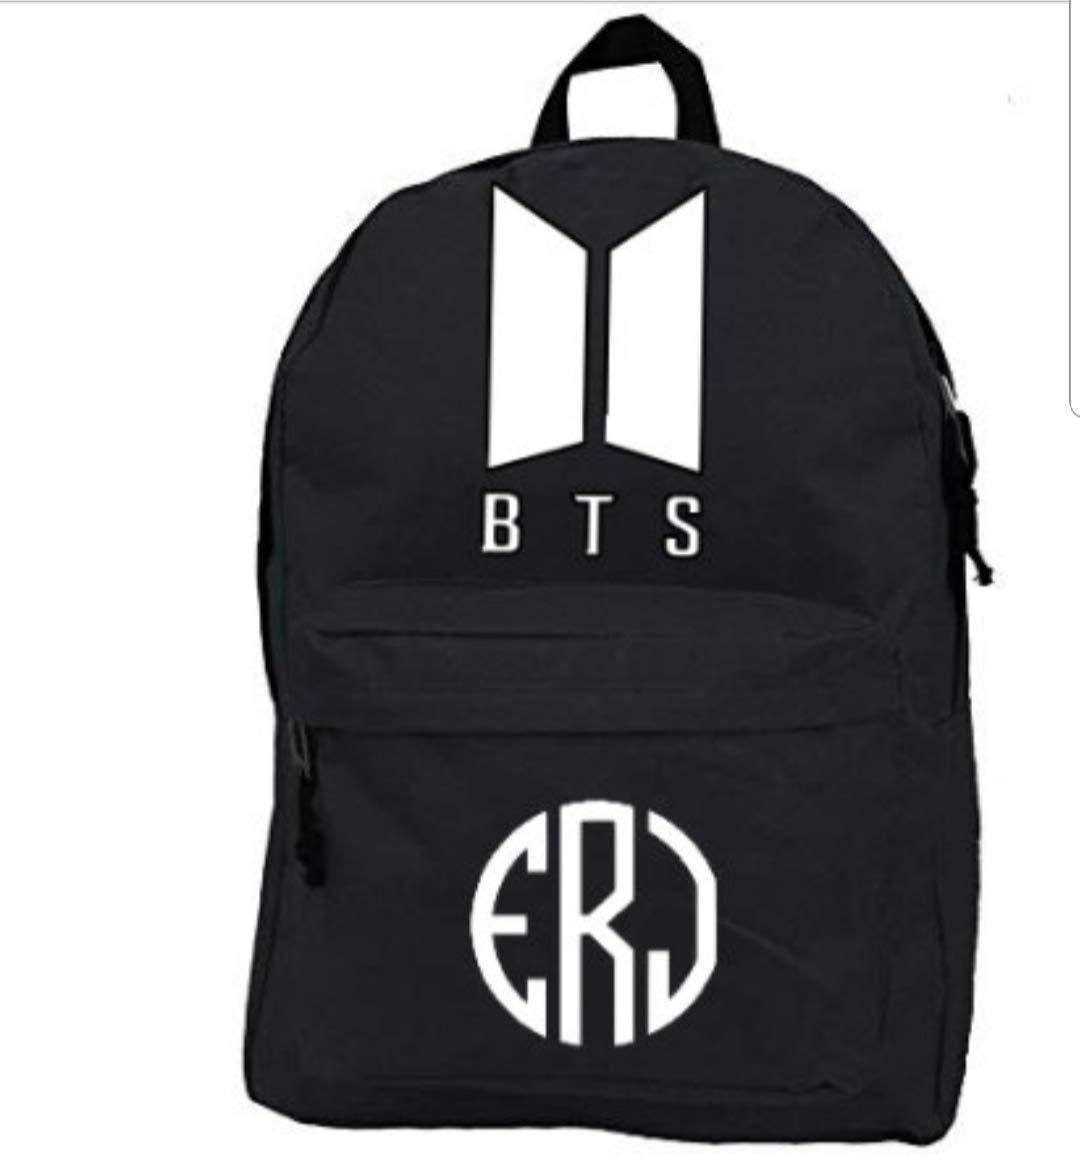 Fashion Kpop BTS Backpack School Travel Bag